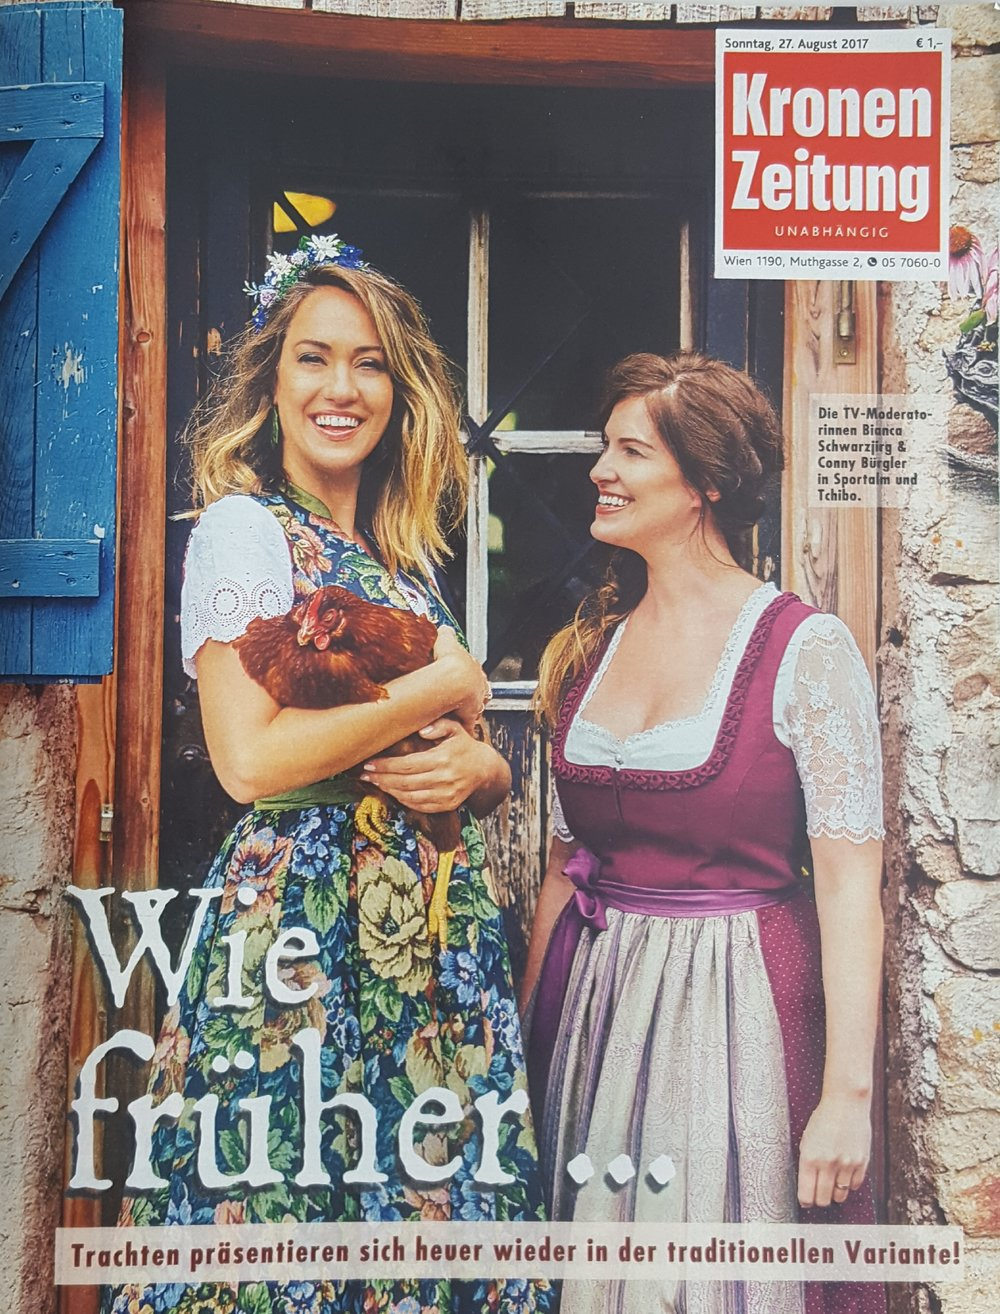 Krone 2017 edition lieblingsstueckerl 2.jpg